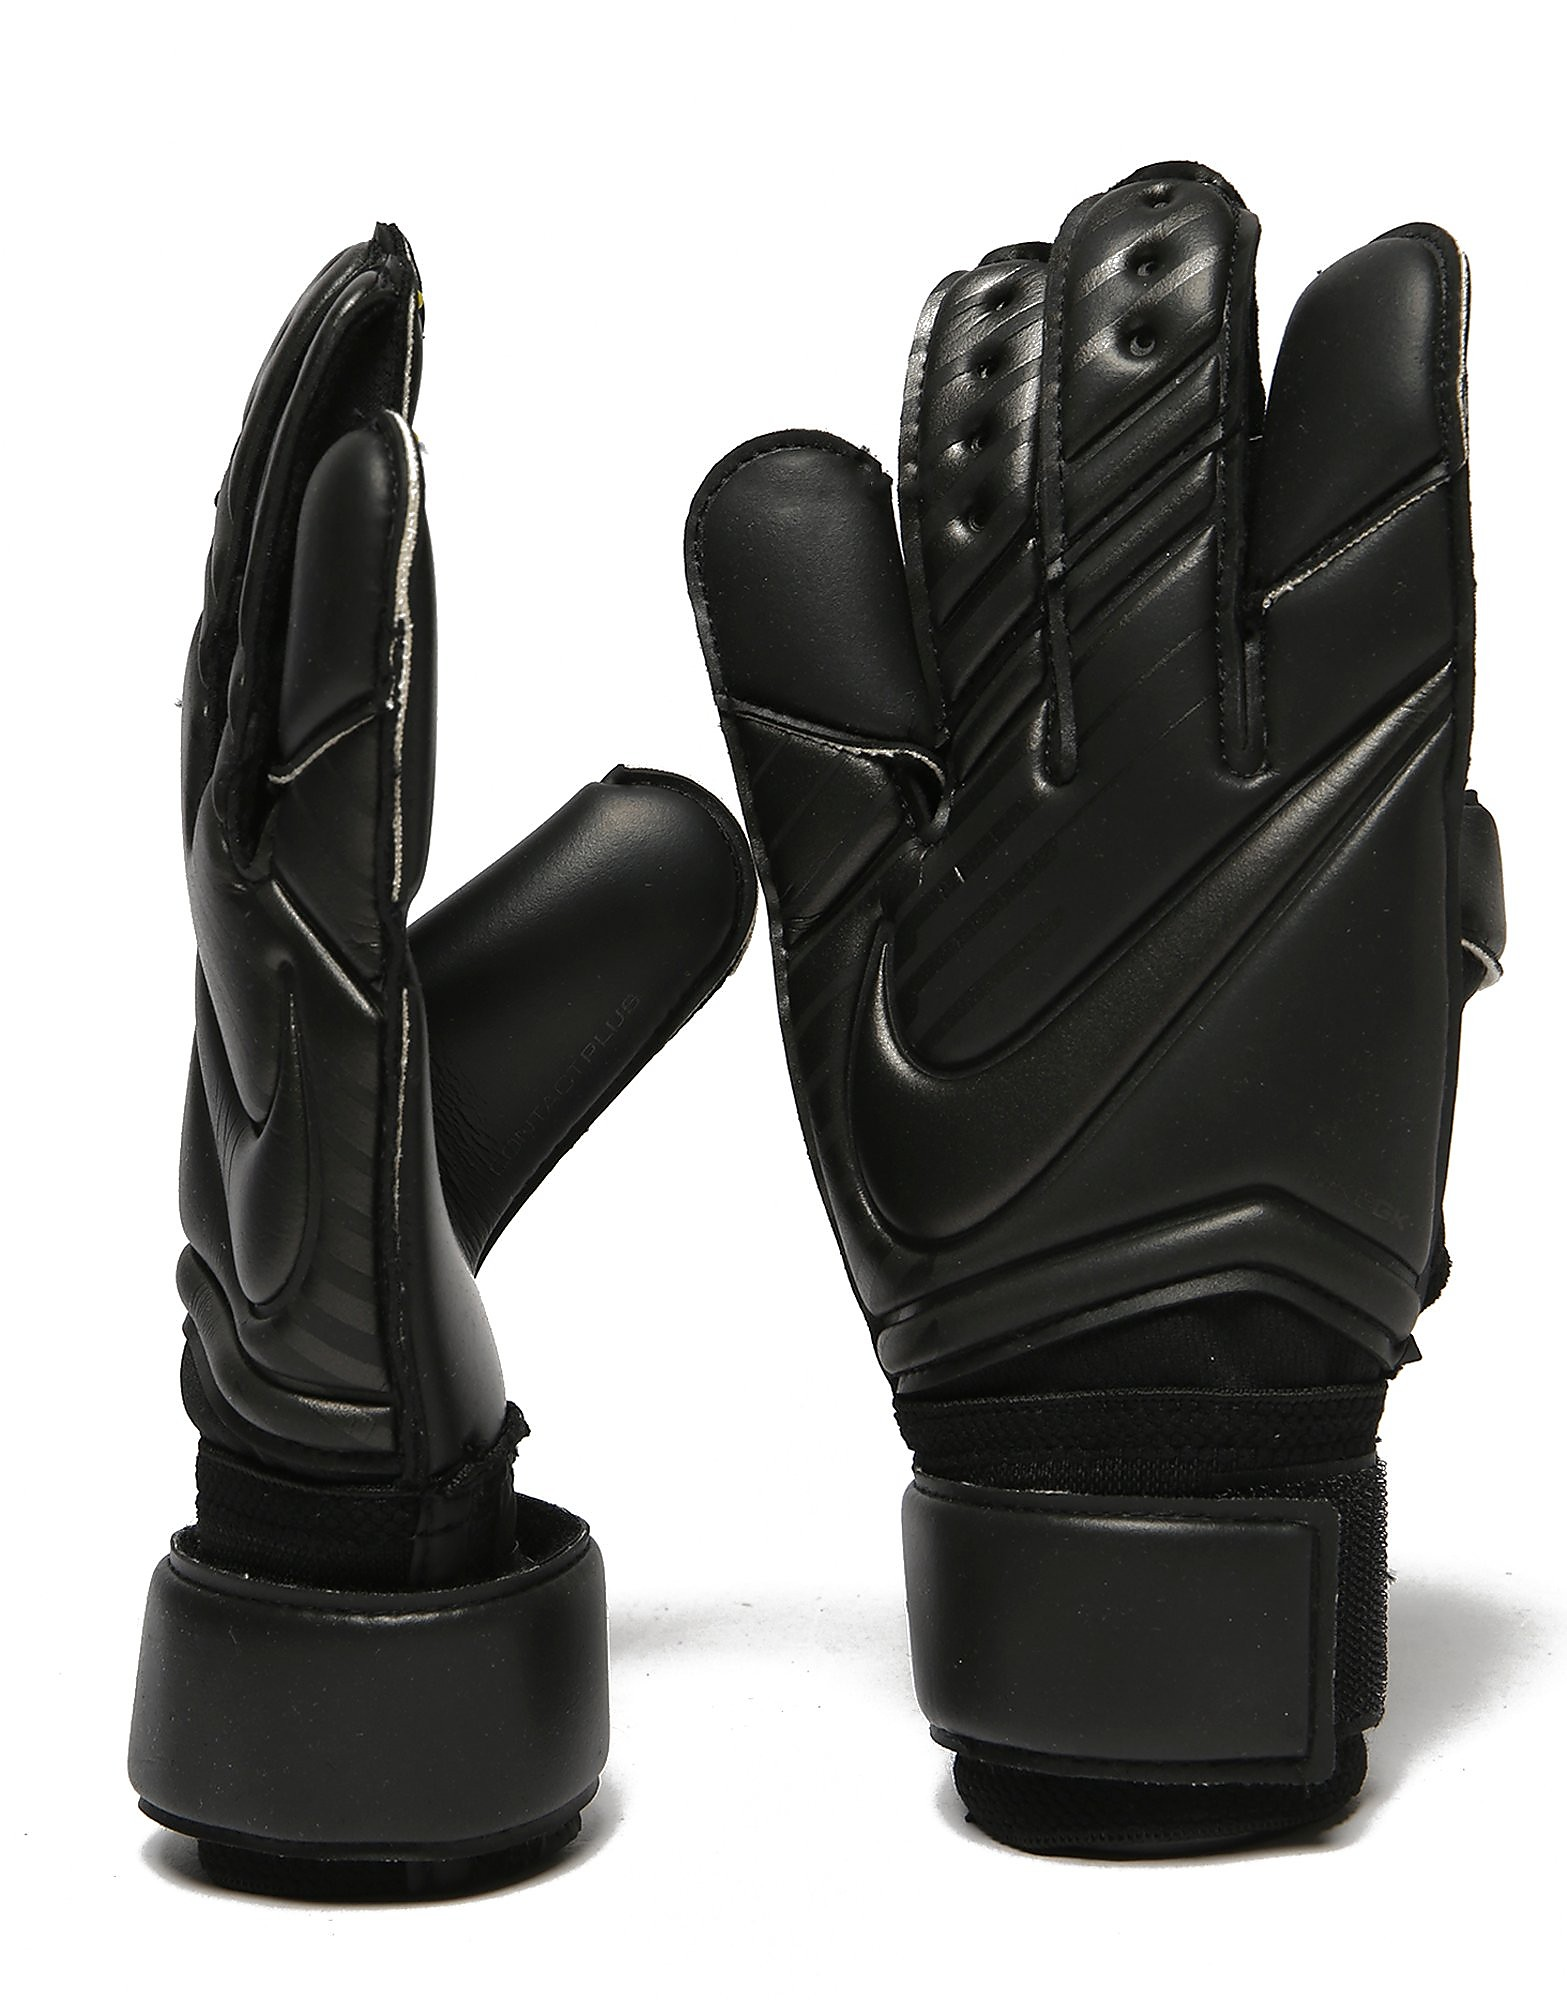 Nike Vapor Grip3 Guanti Calcio